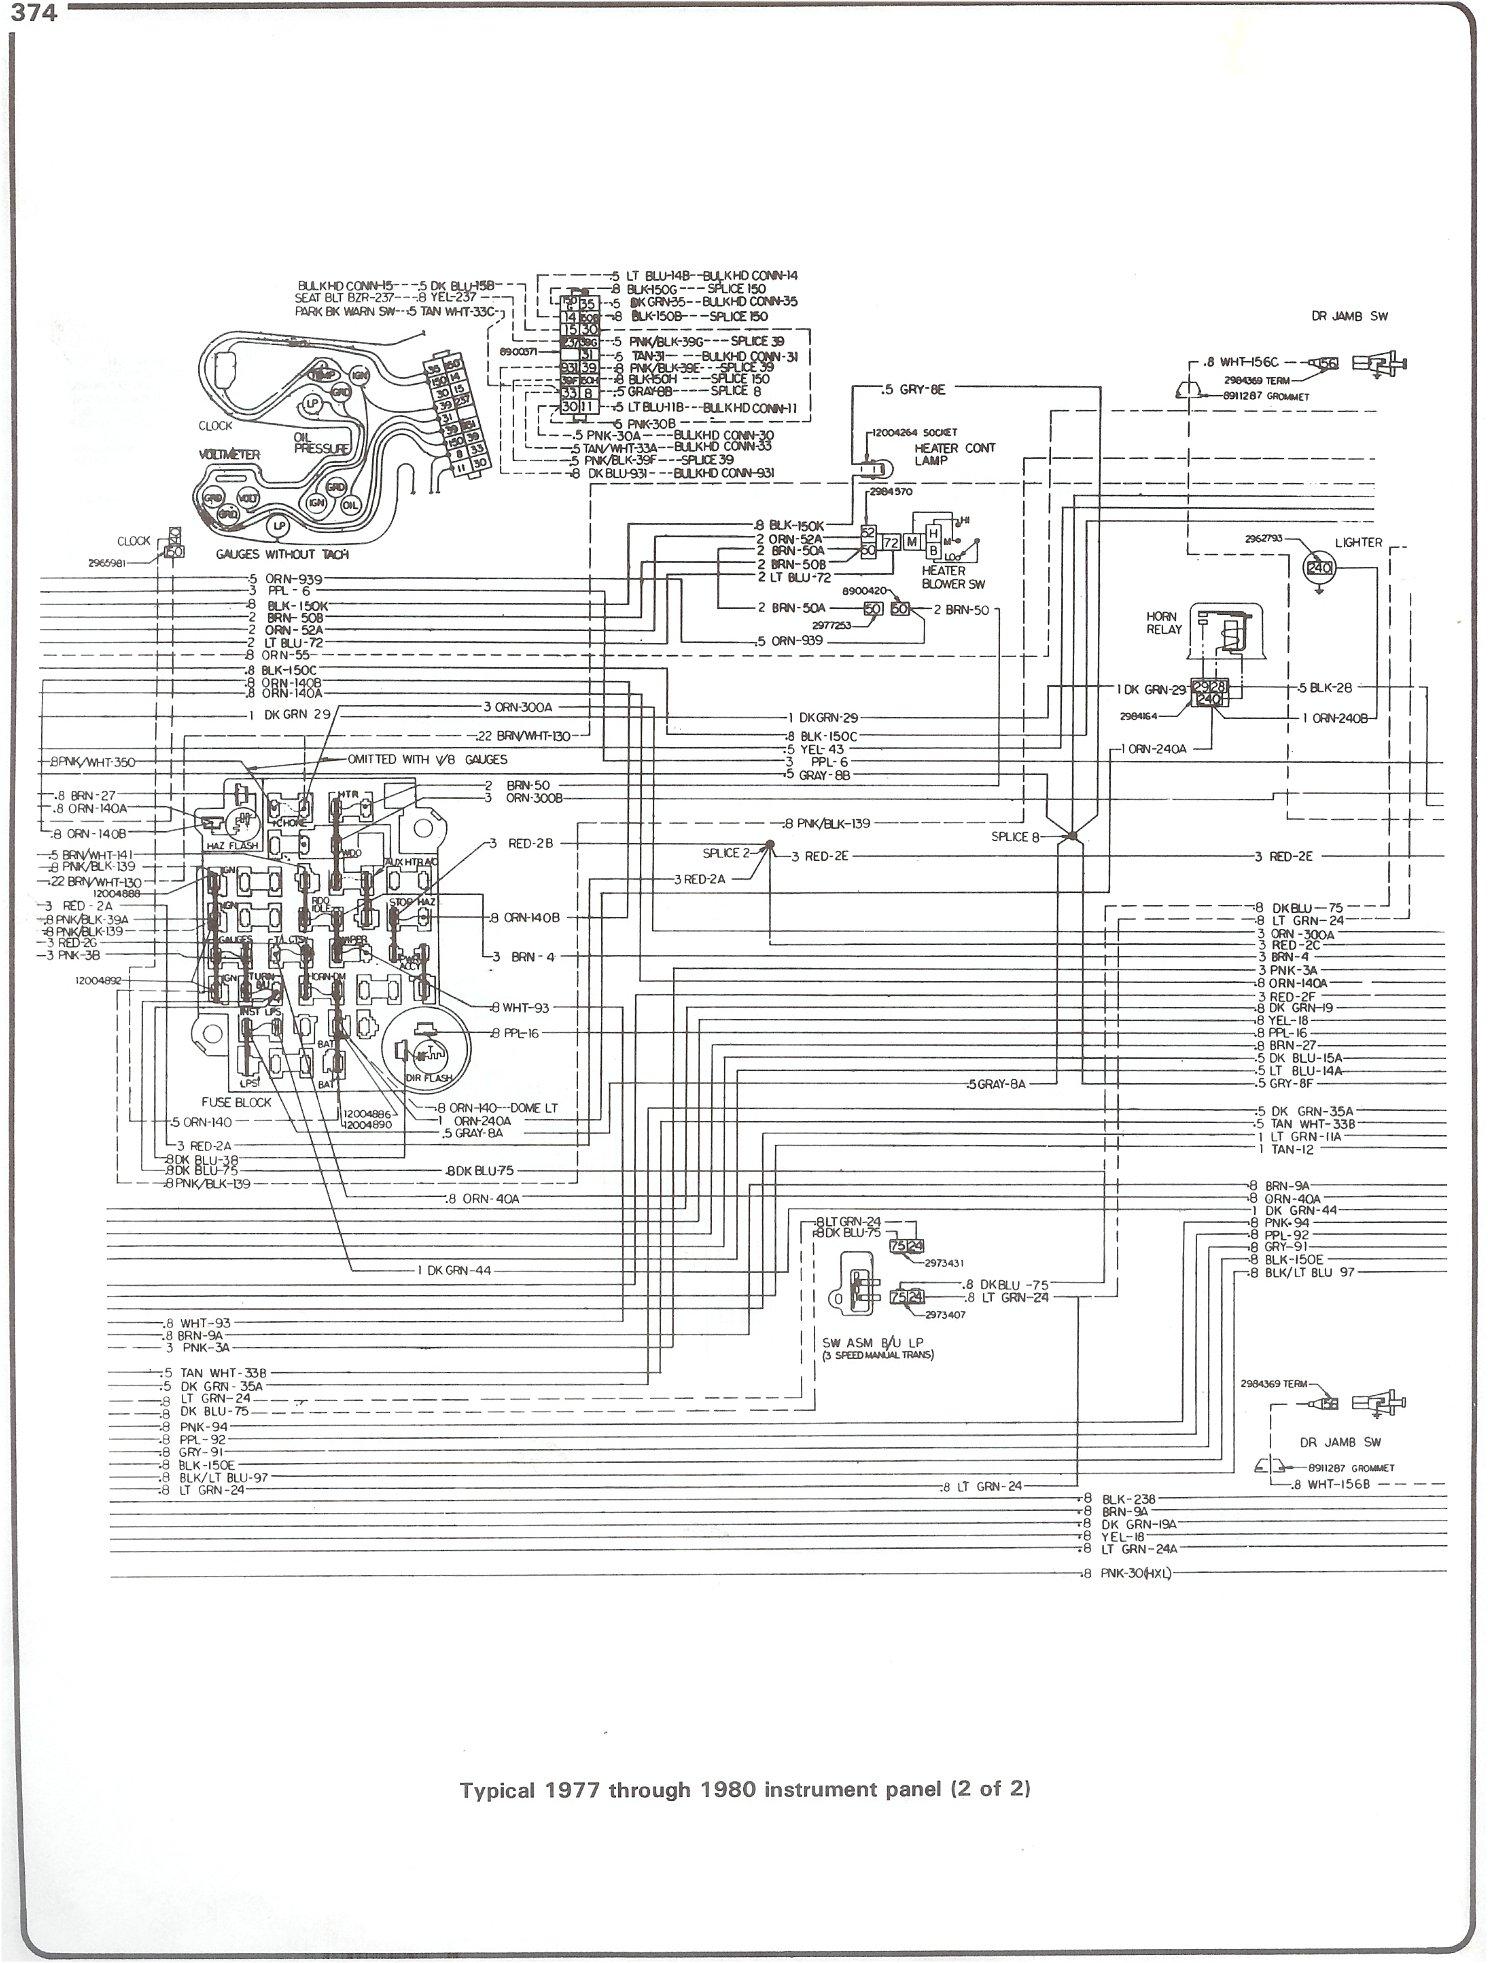 1993 Chevrolet Pu Wiring Diagram